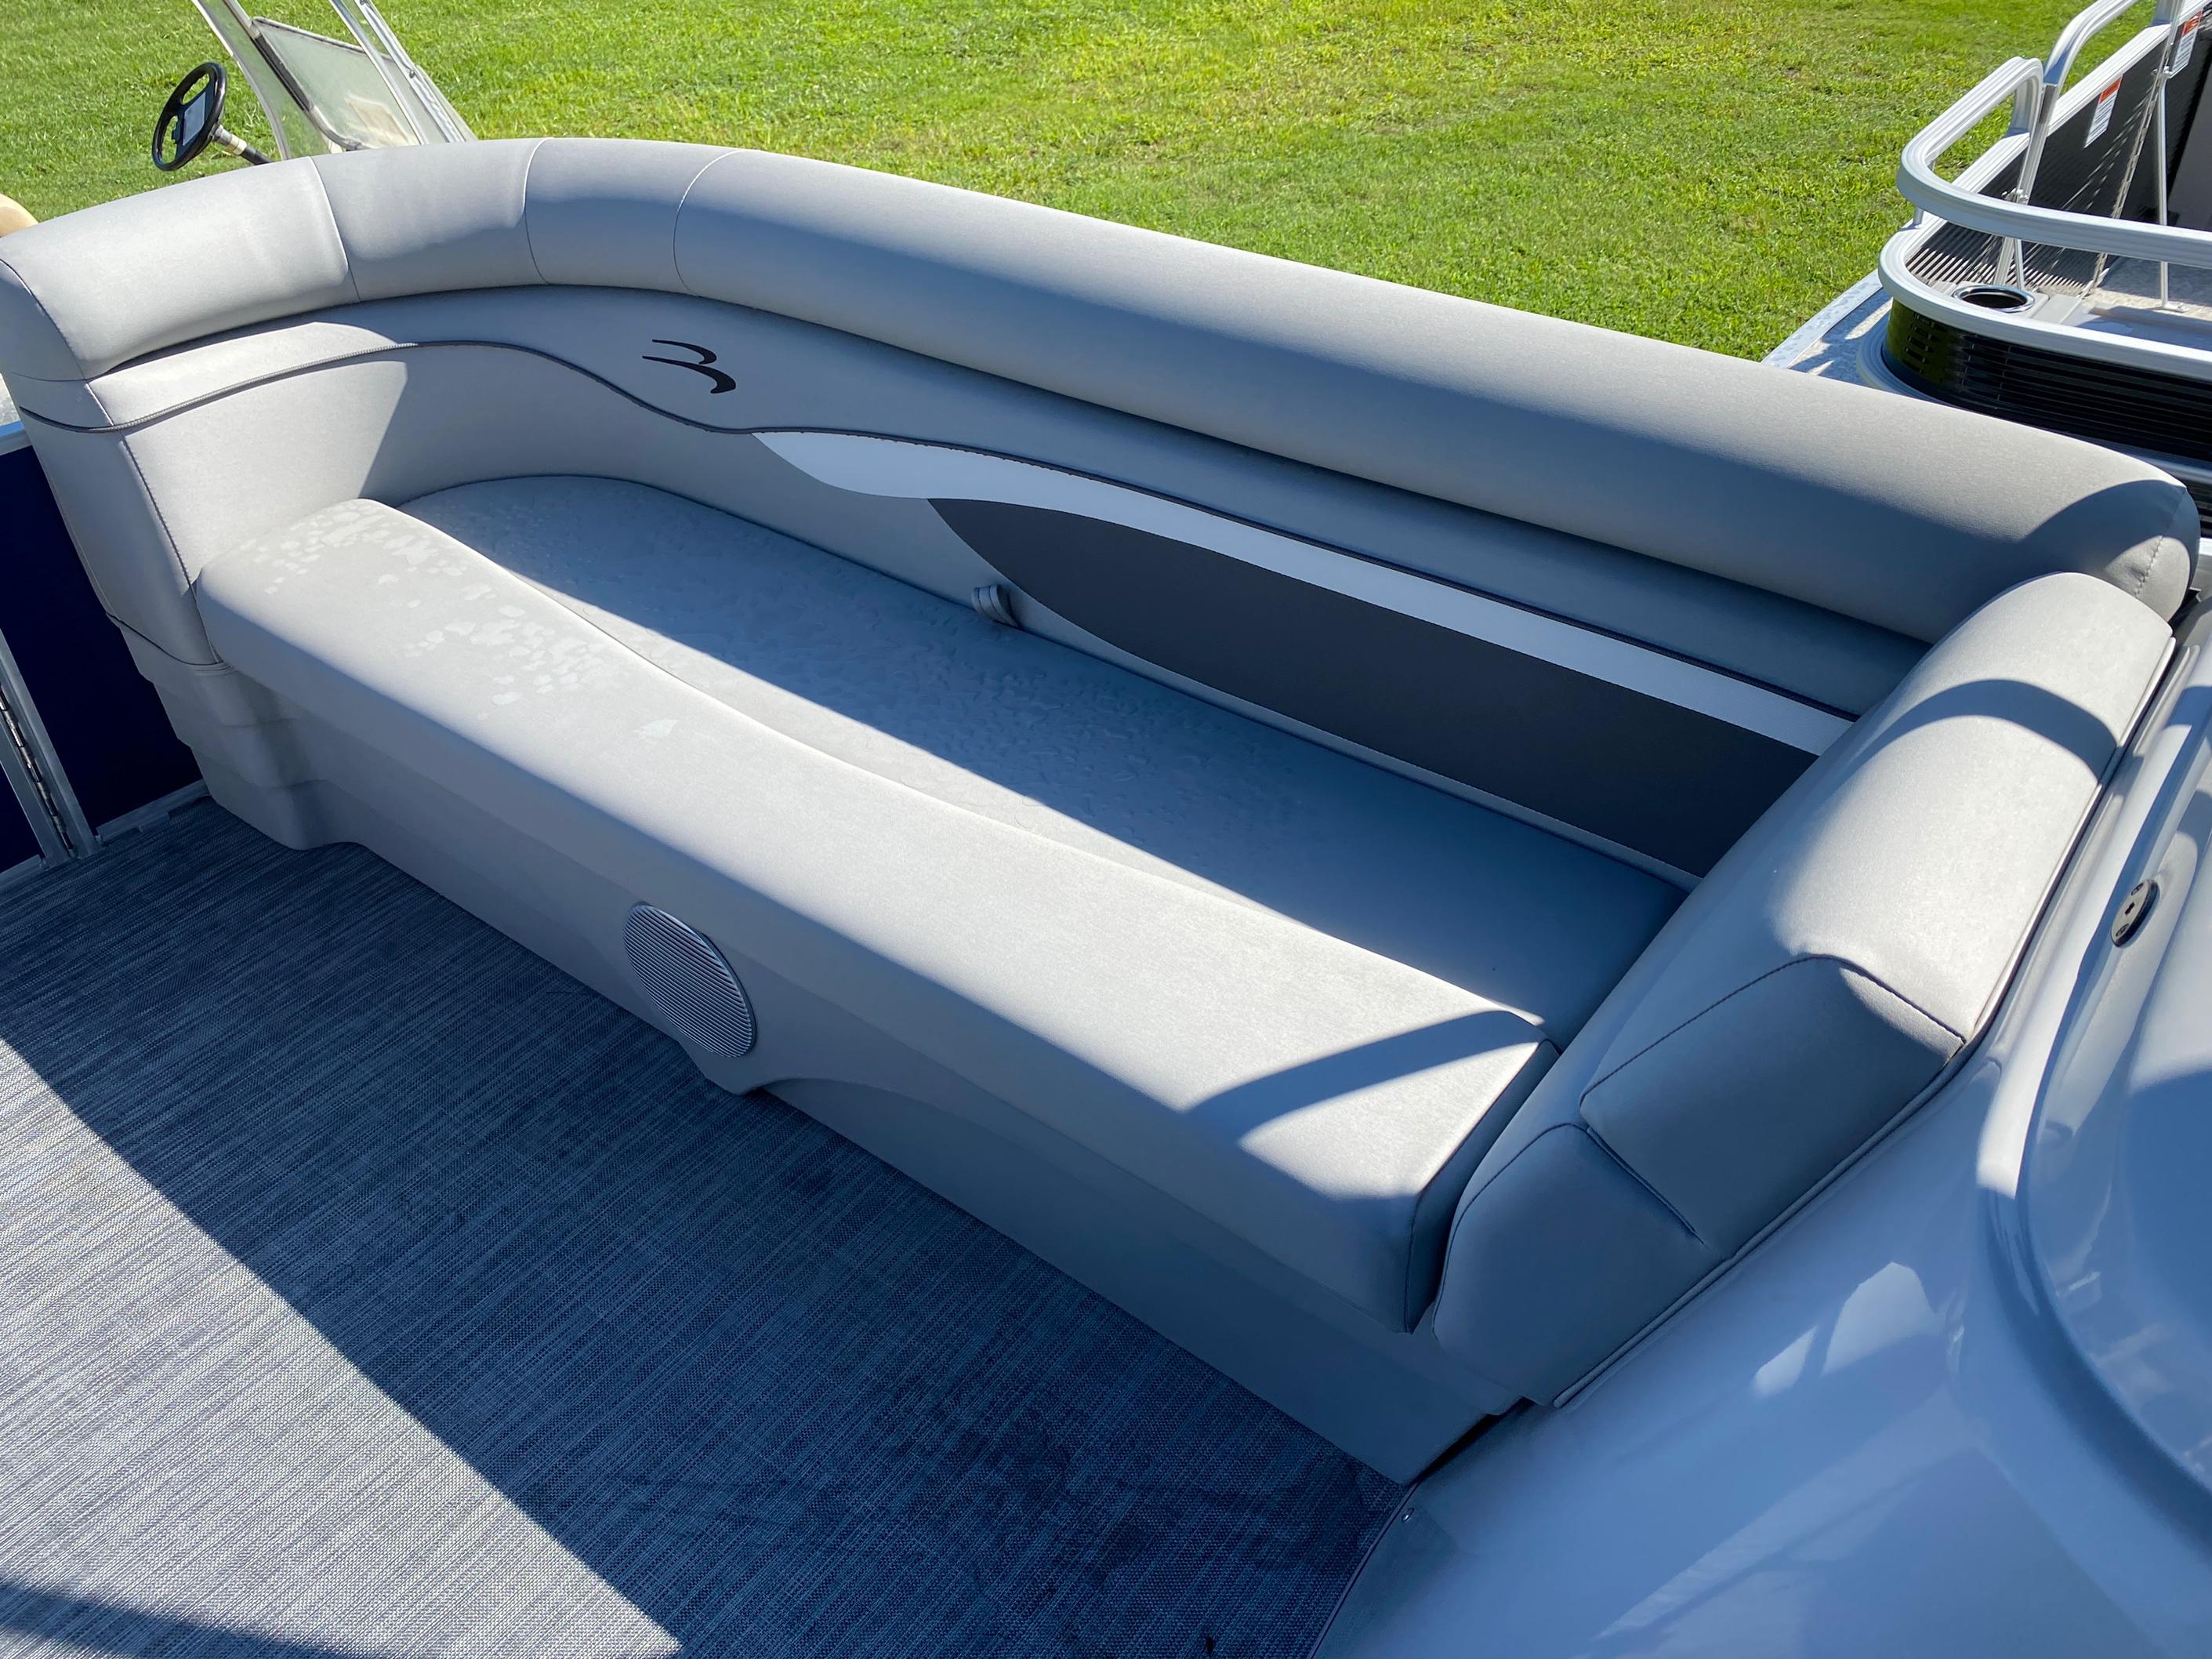 2021 Bennington boat for sale, model of the boat is 20 SVL & Image # 3 of 9